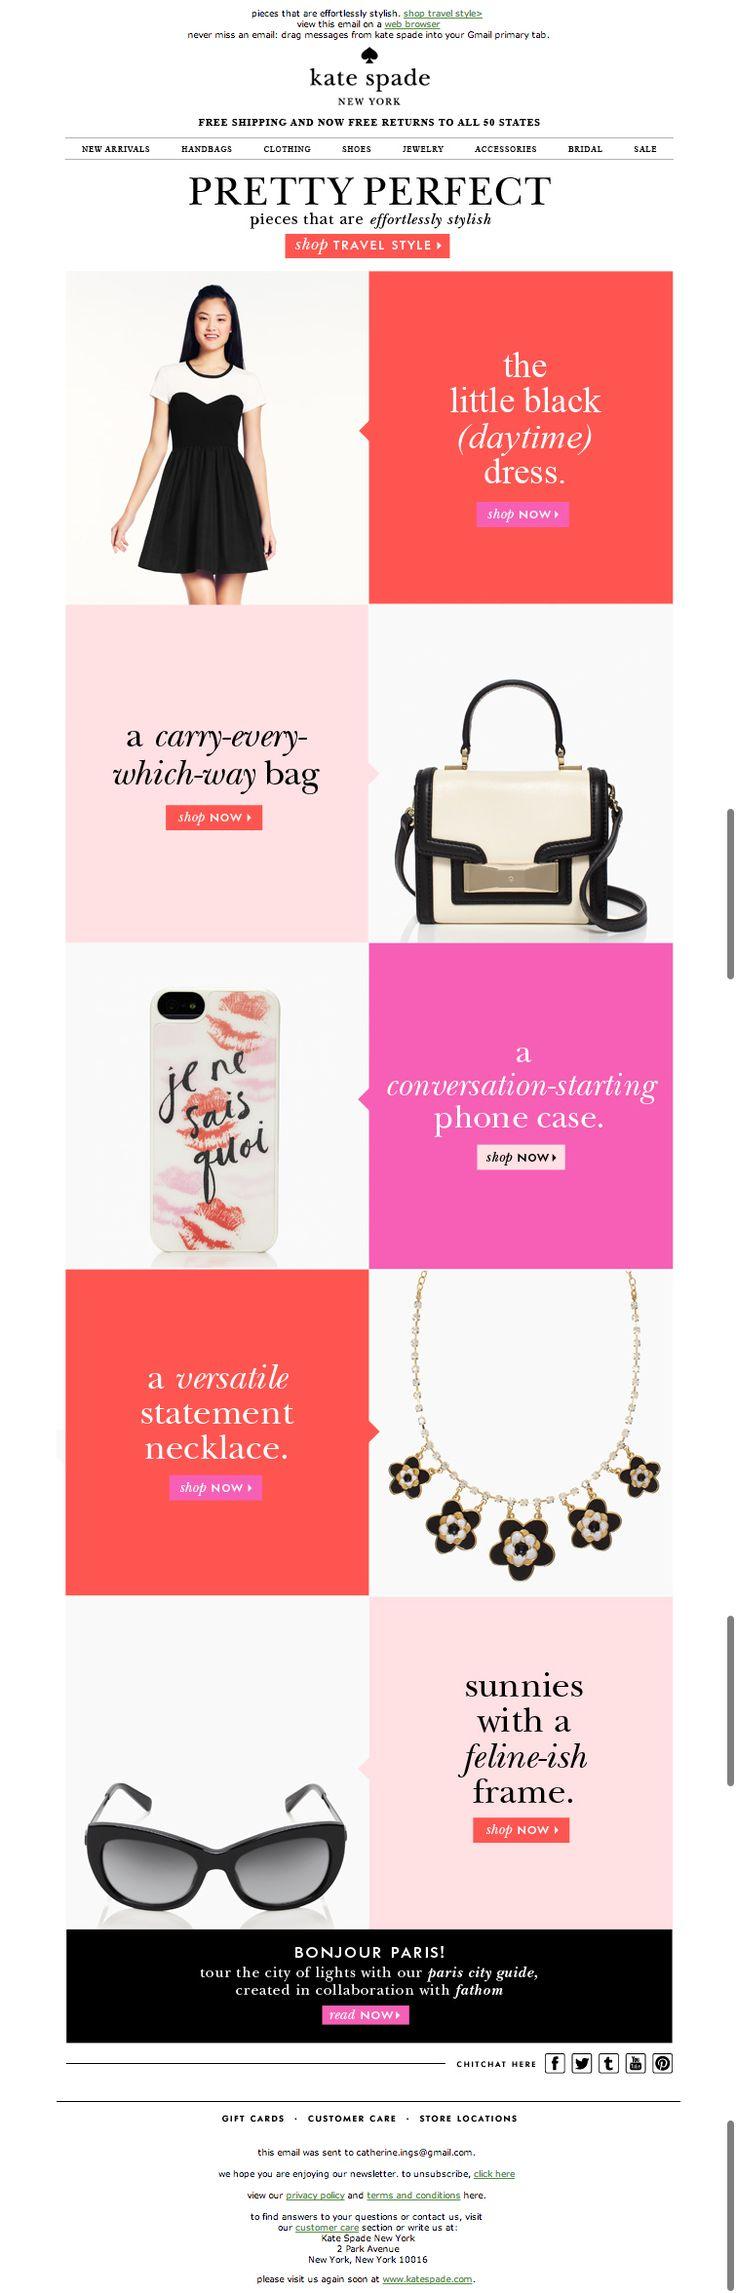 Kate Spade email design